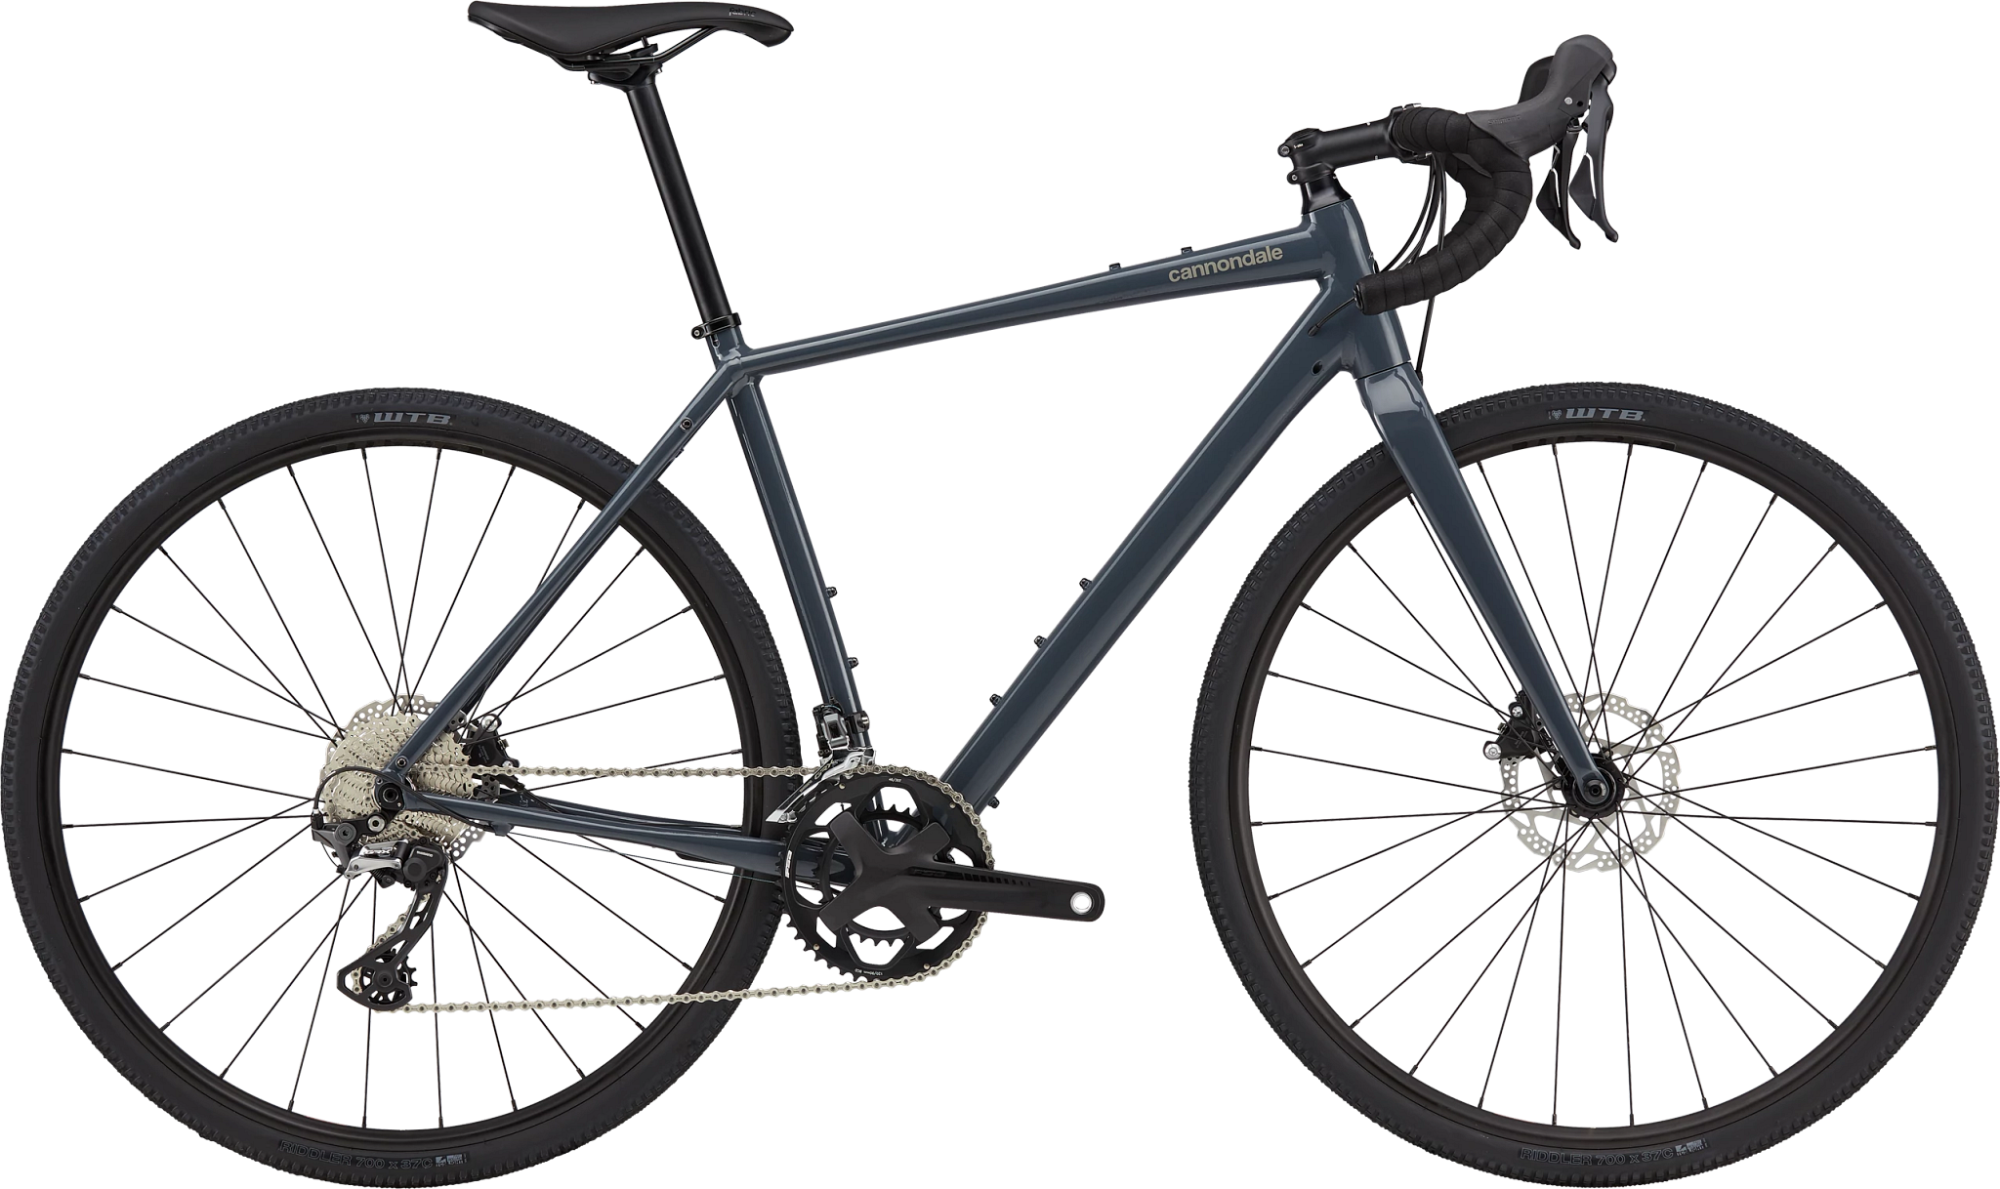 Cannondale Topstone 1 Gravel Bike 2021 Slate Grey